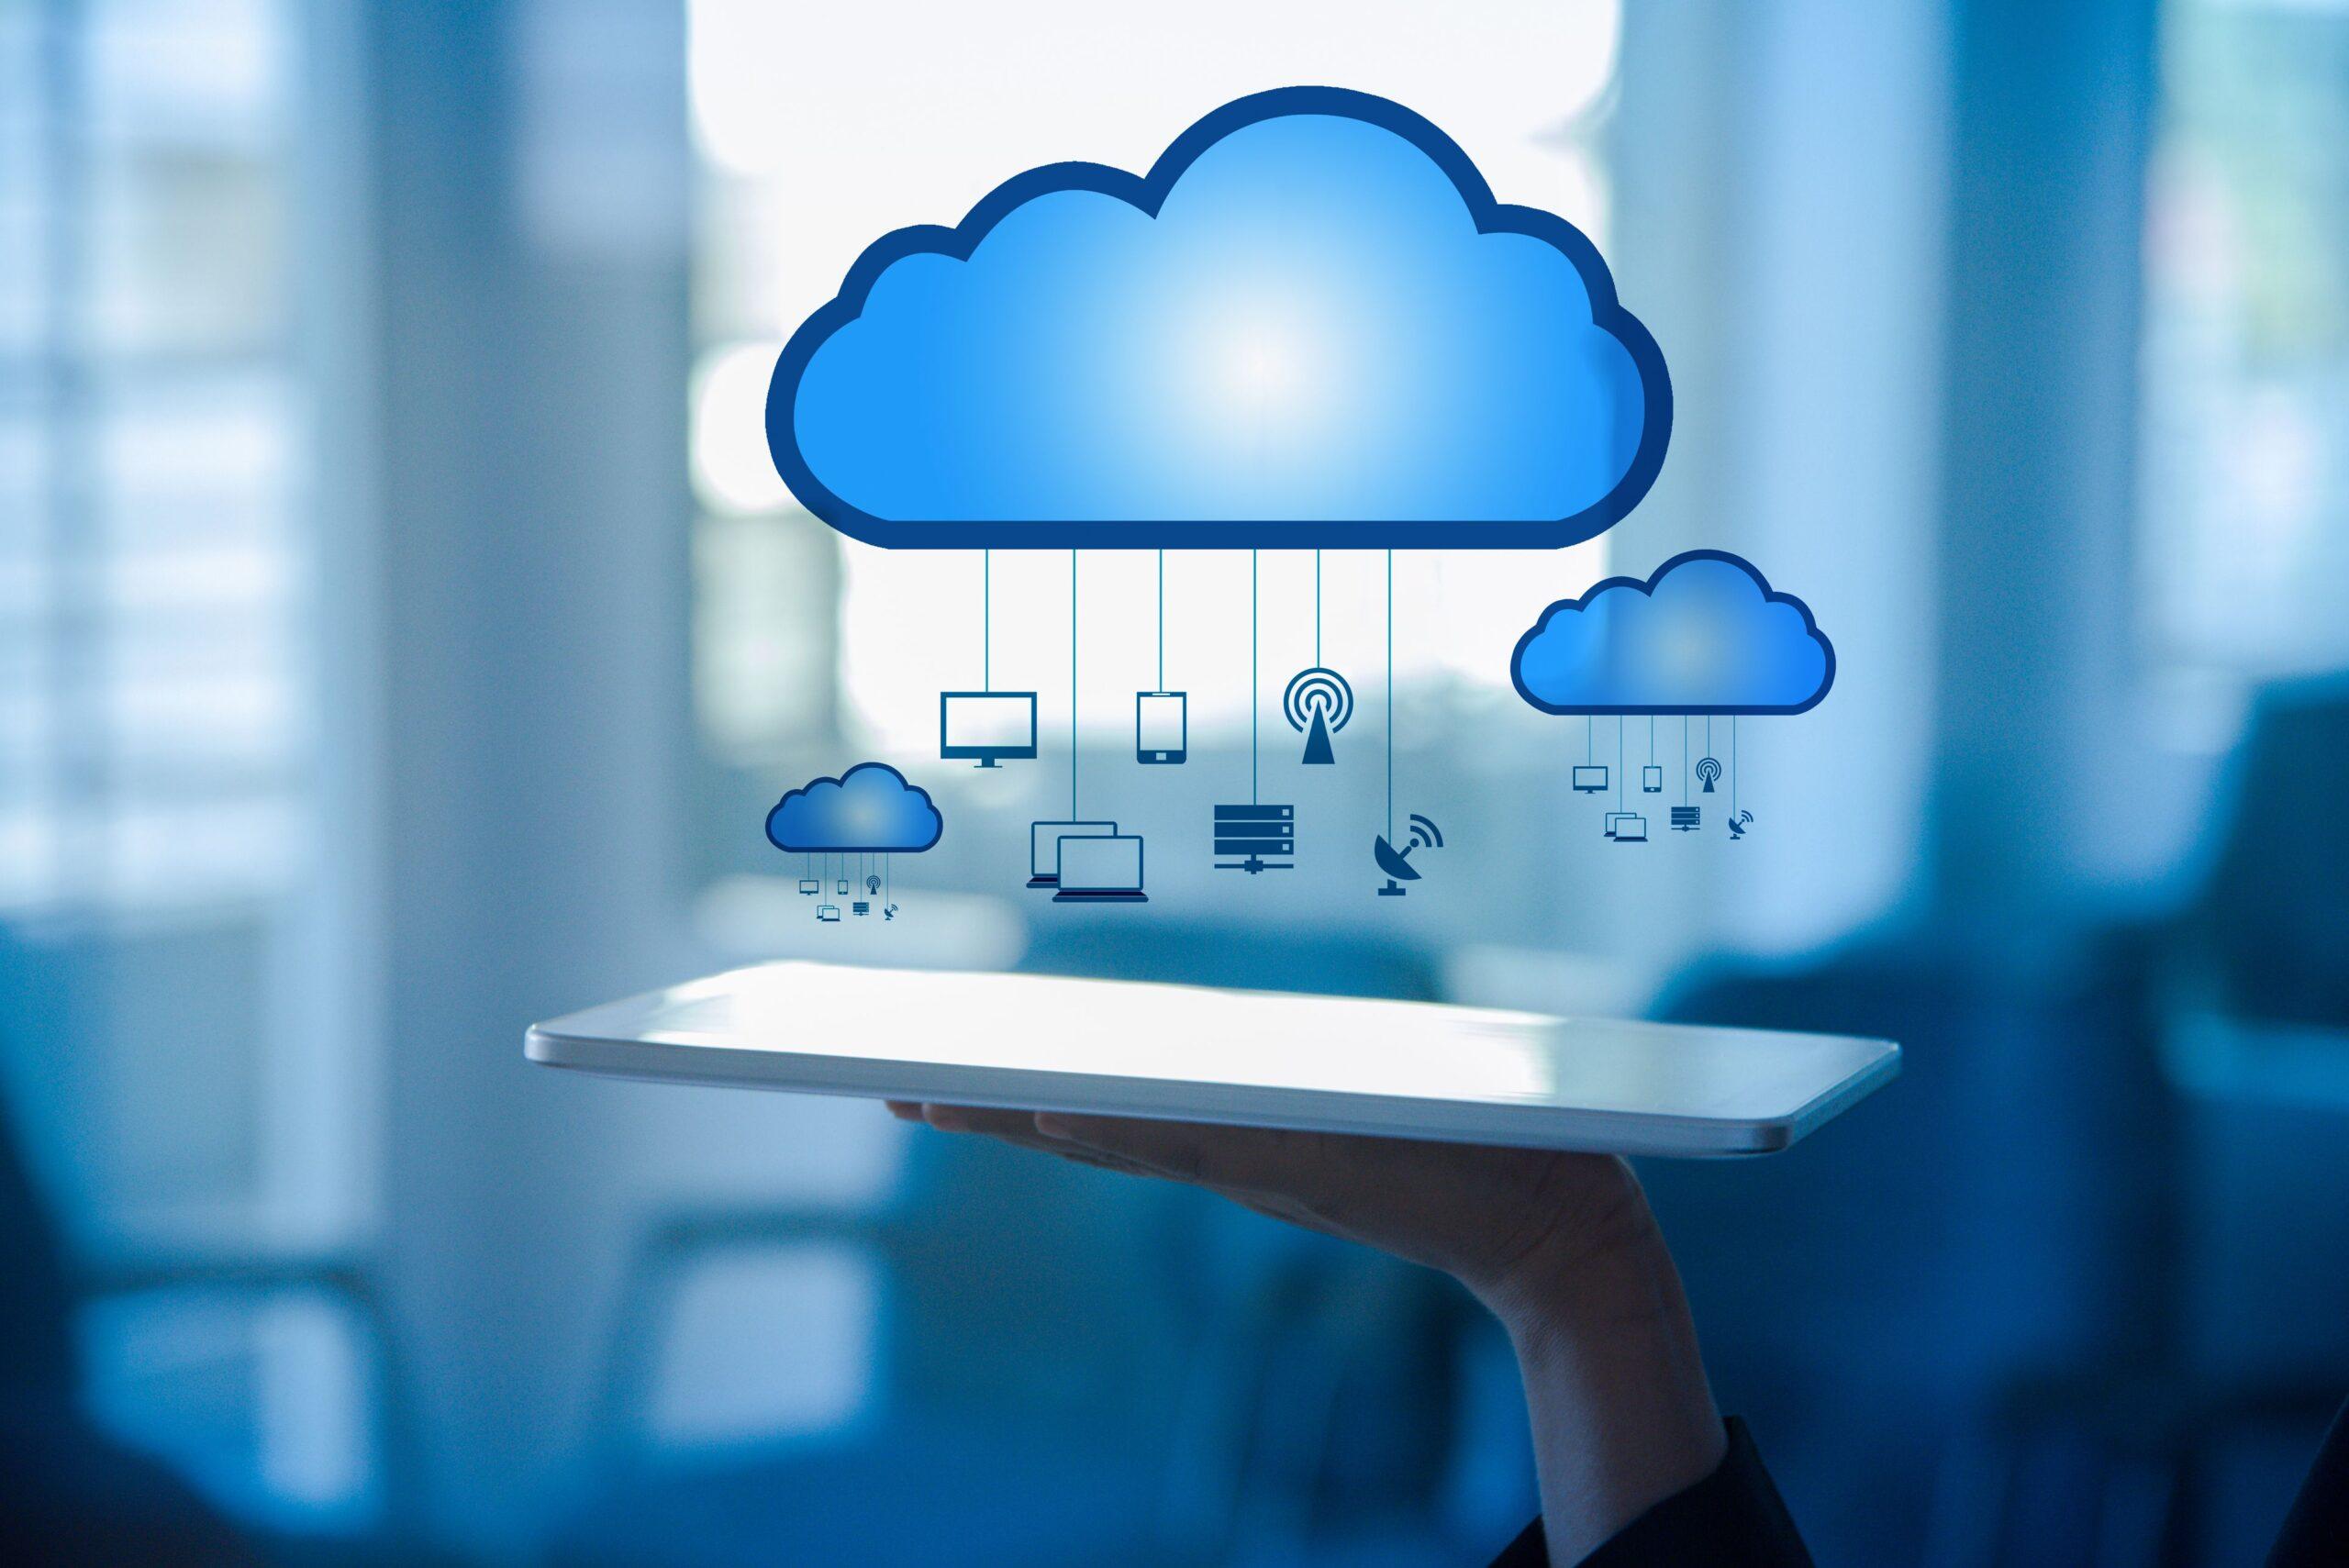 Research: Multicloud deployment increases among enterprises